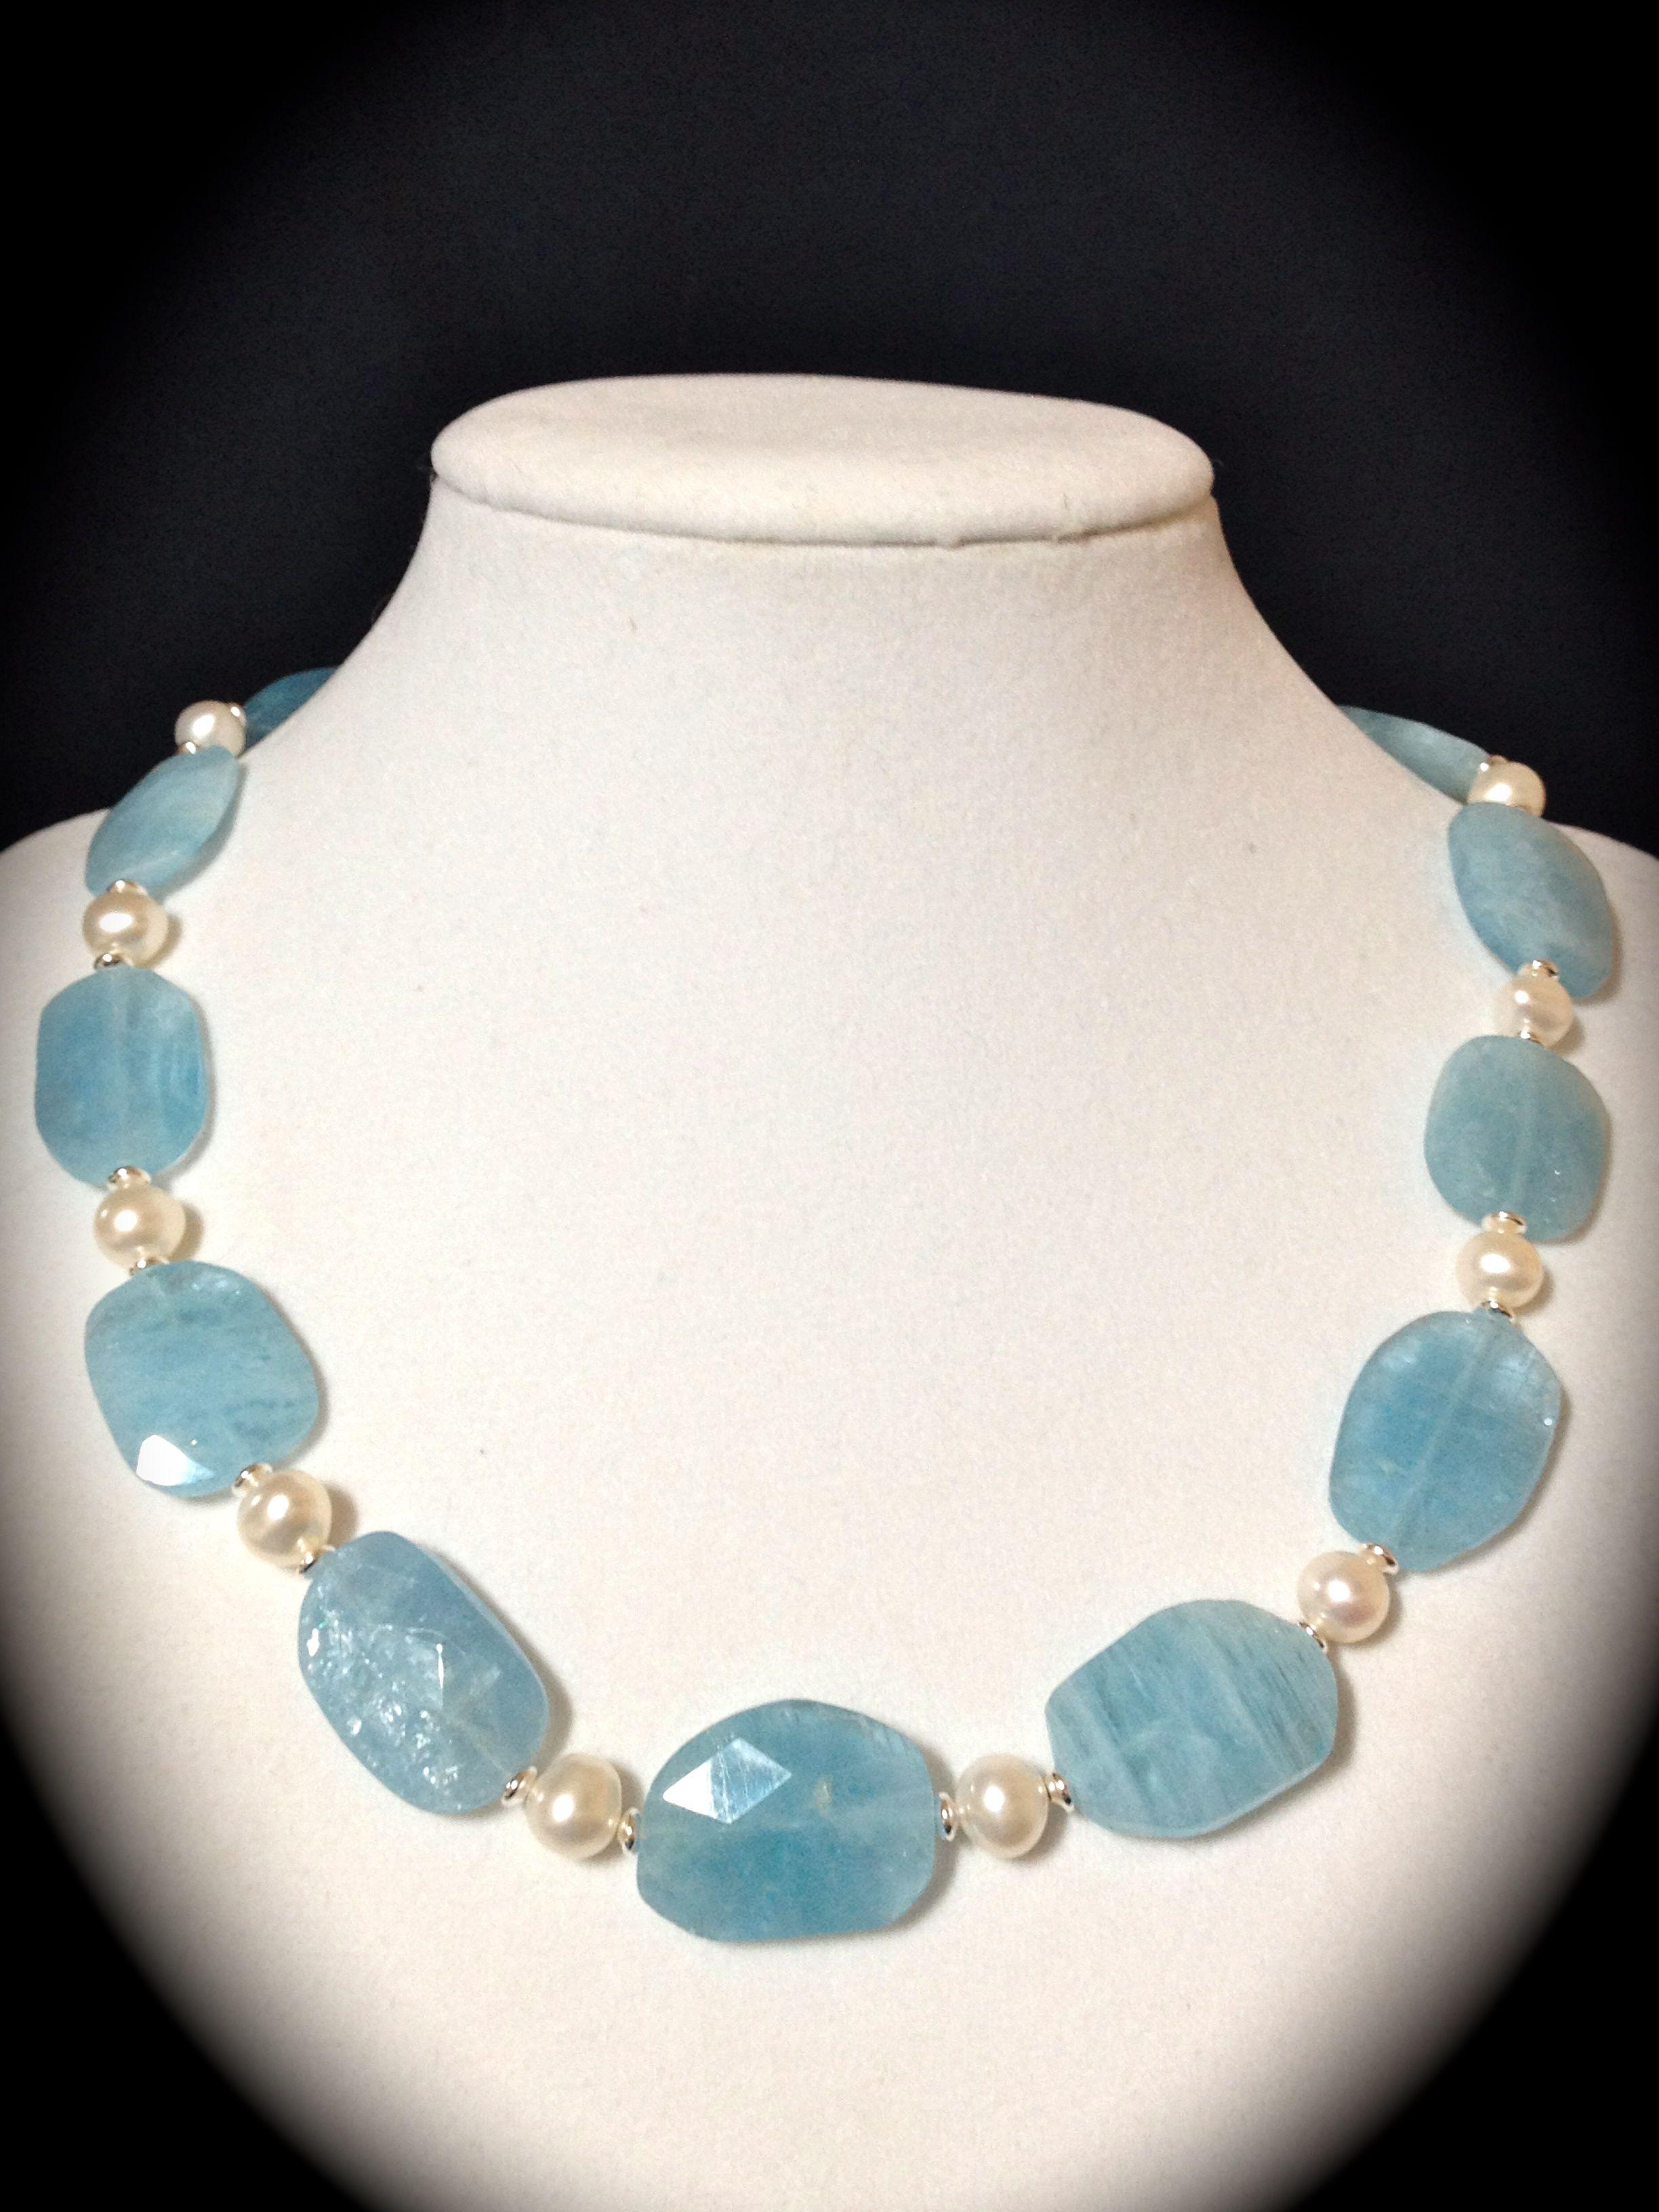 Aquamarine and Pearls